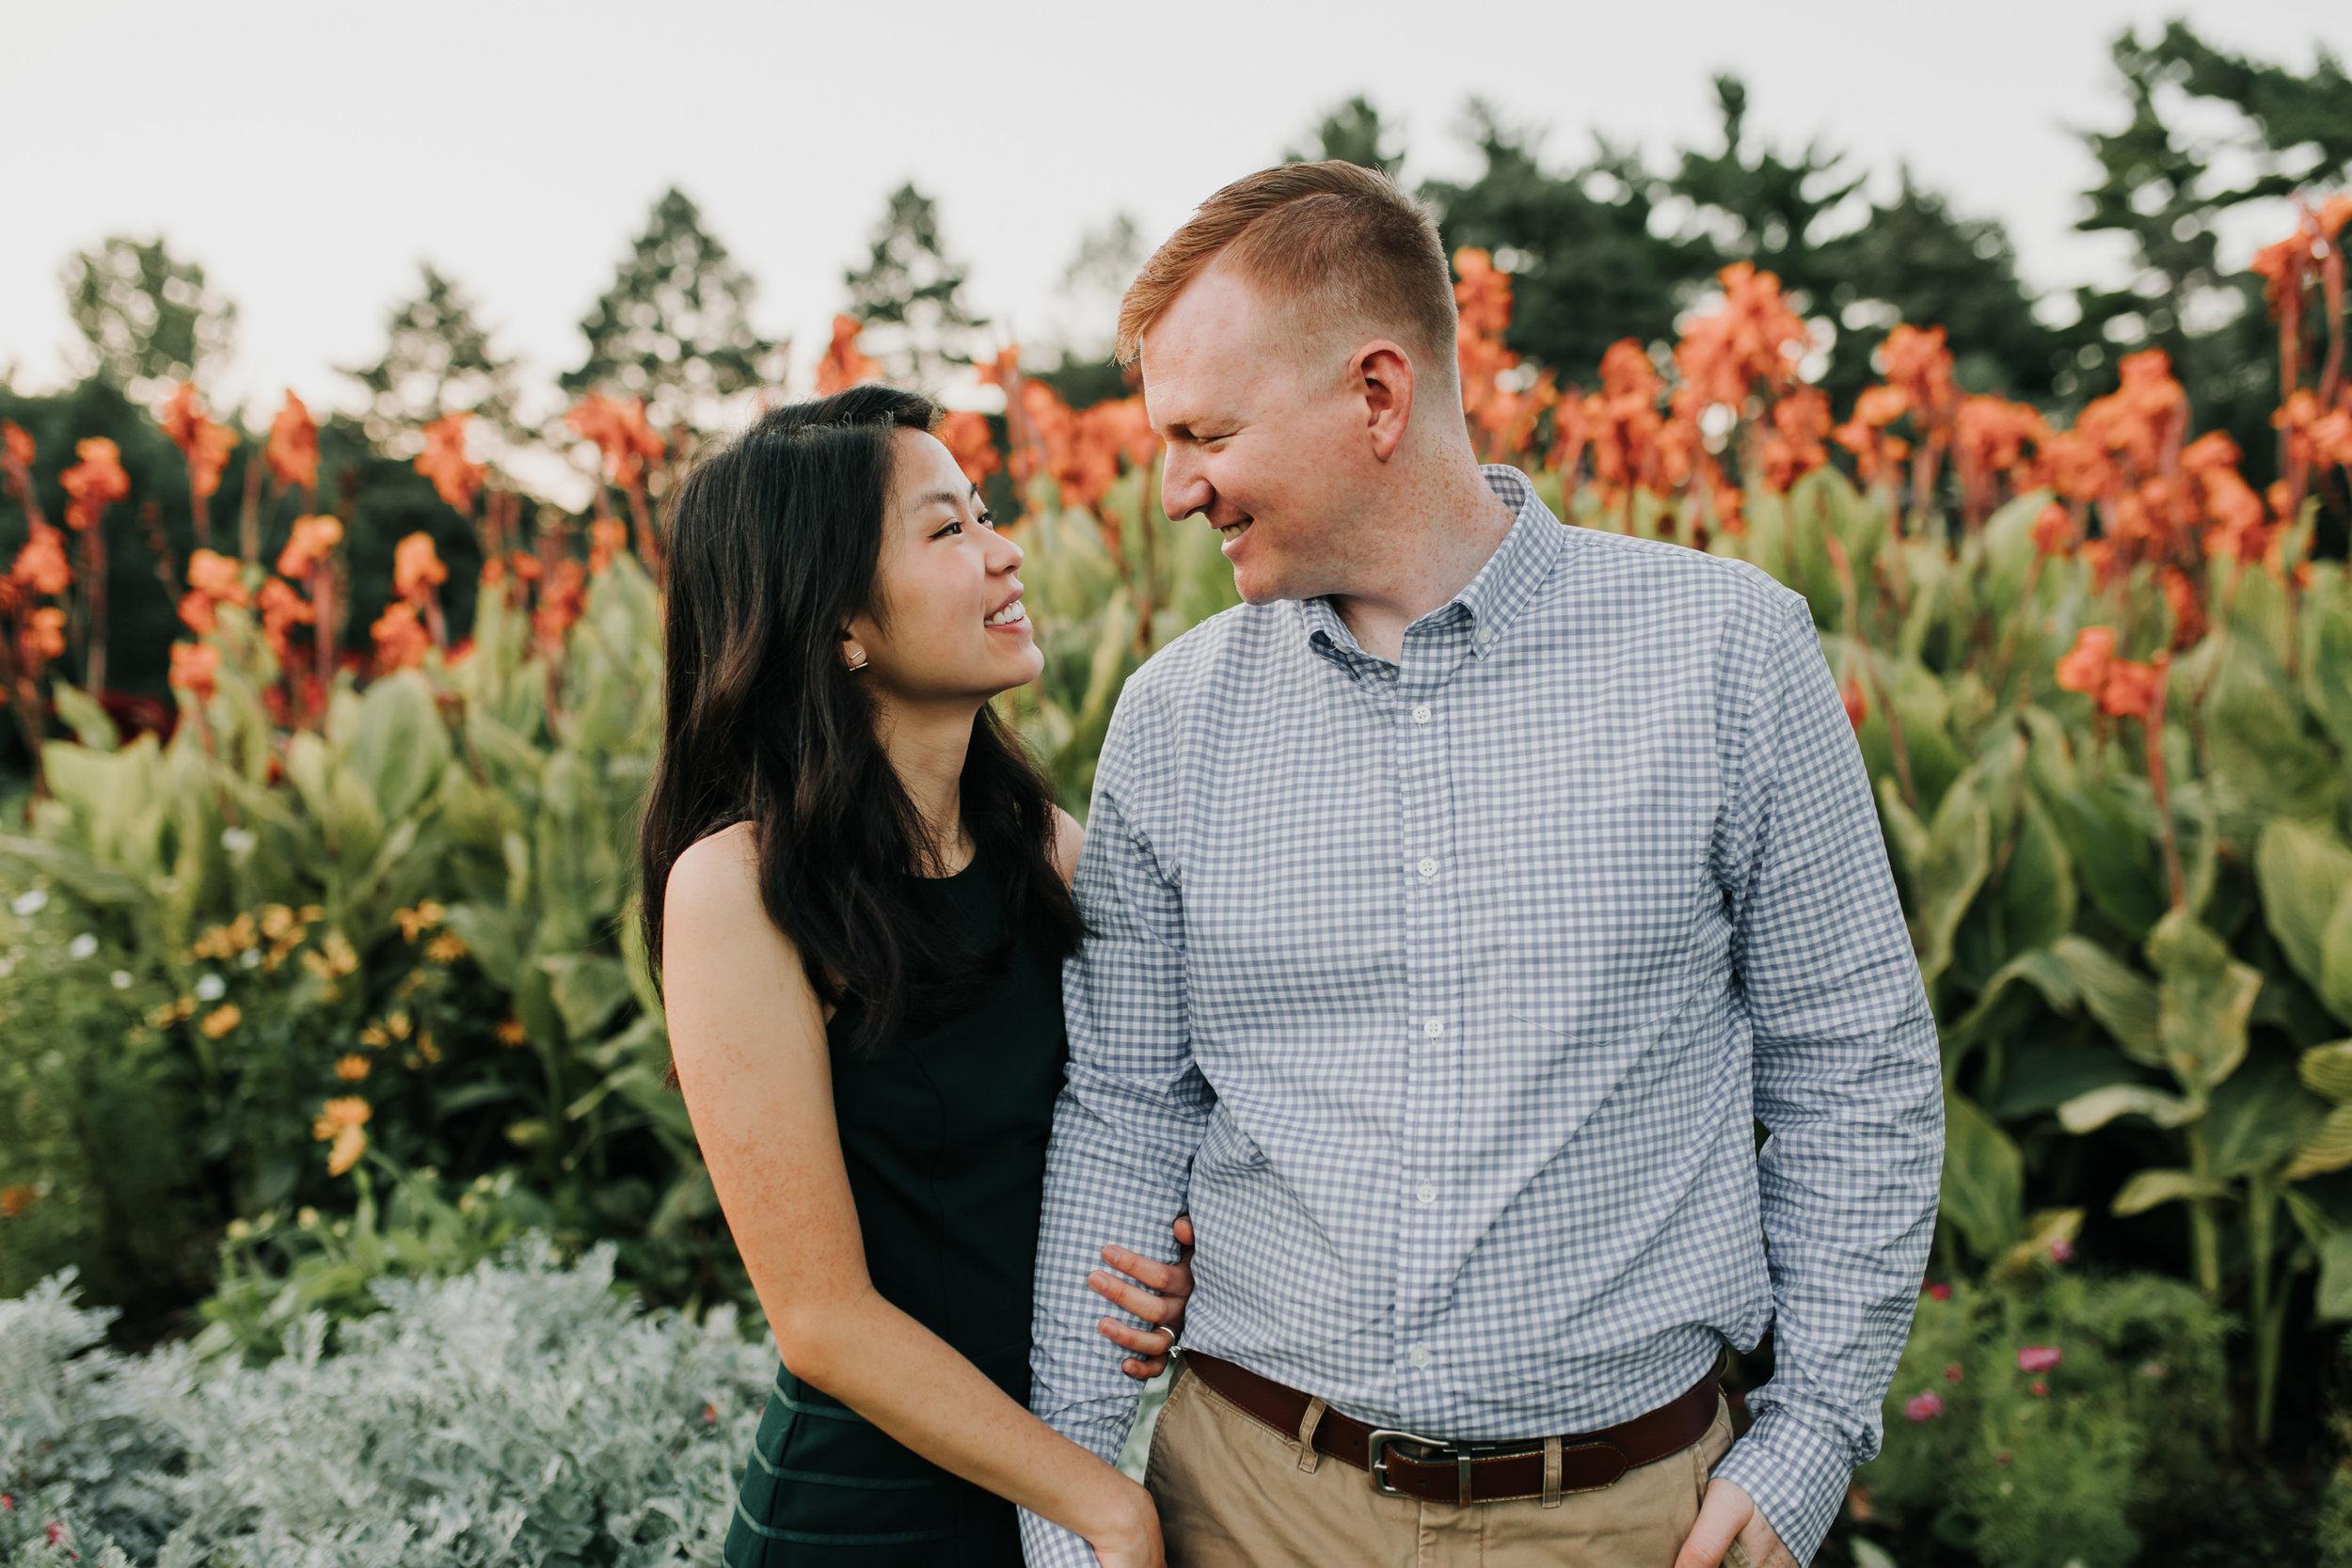 Catherin & Kyle - Married - Nathaniel Jensen Photography - Omaha Nebraska Wedding Photograper - Memorial Park - Joslyn Castle Engagement Session-83.jpg